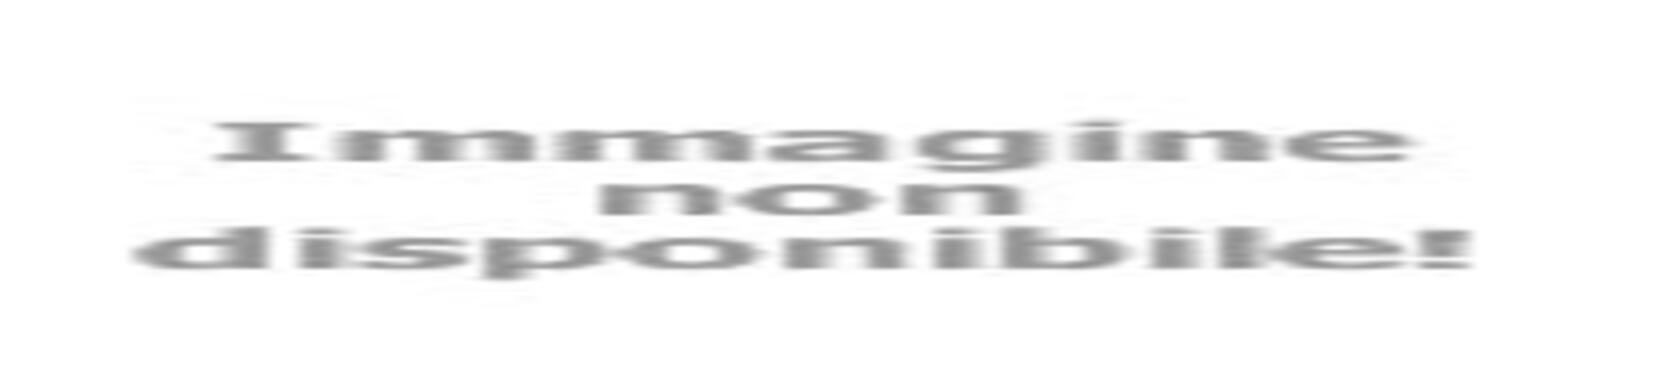 basketriminicrabs it 6-2711-video-eybl-u20-playoff-london-vs-crabs 003